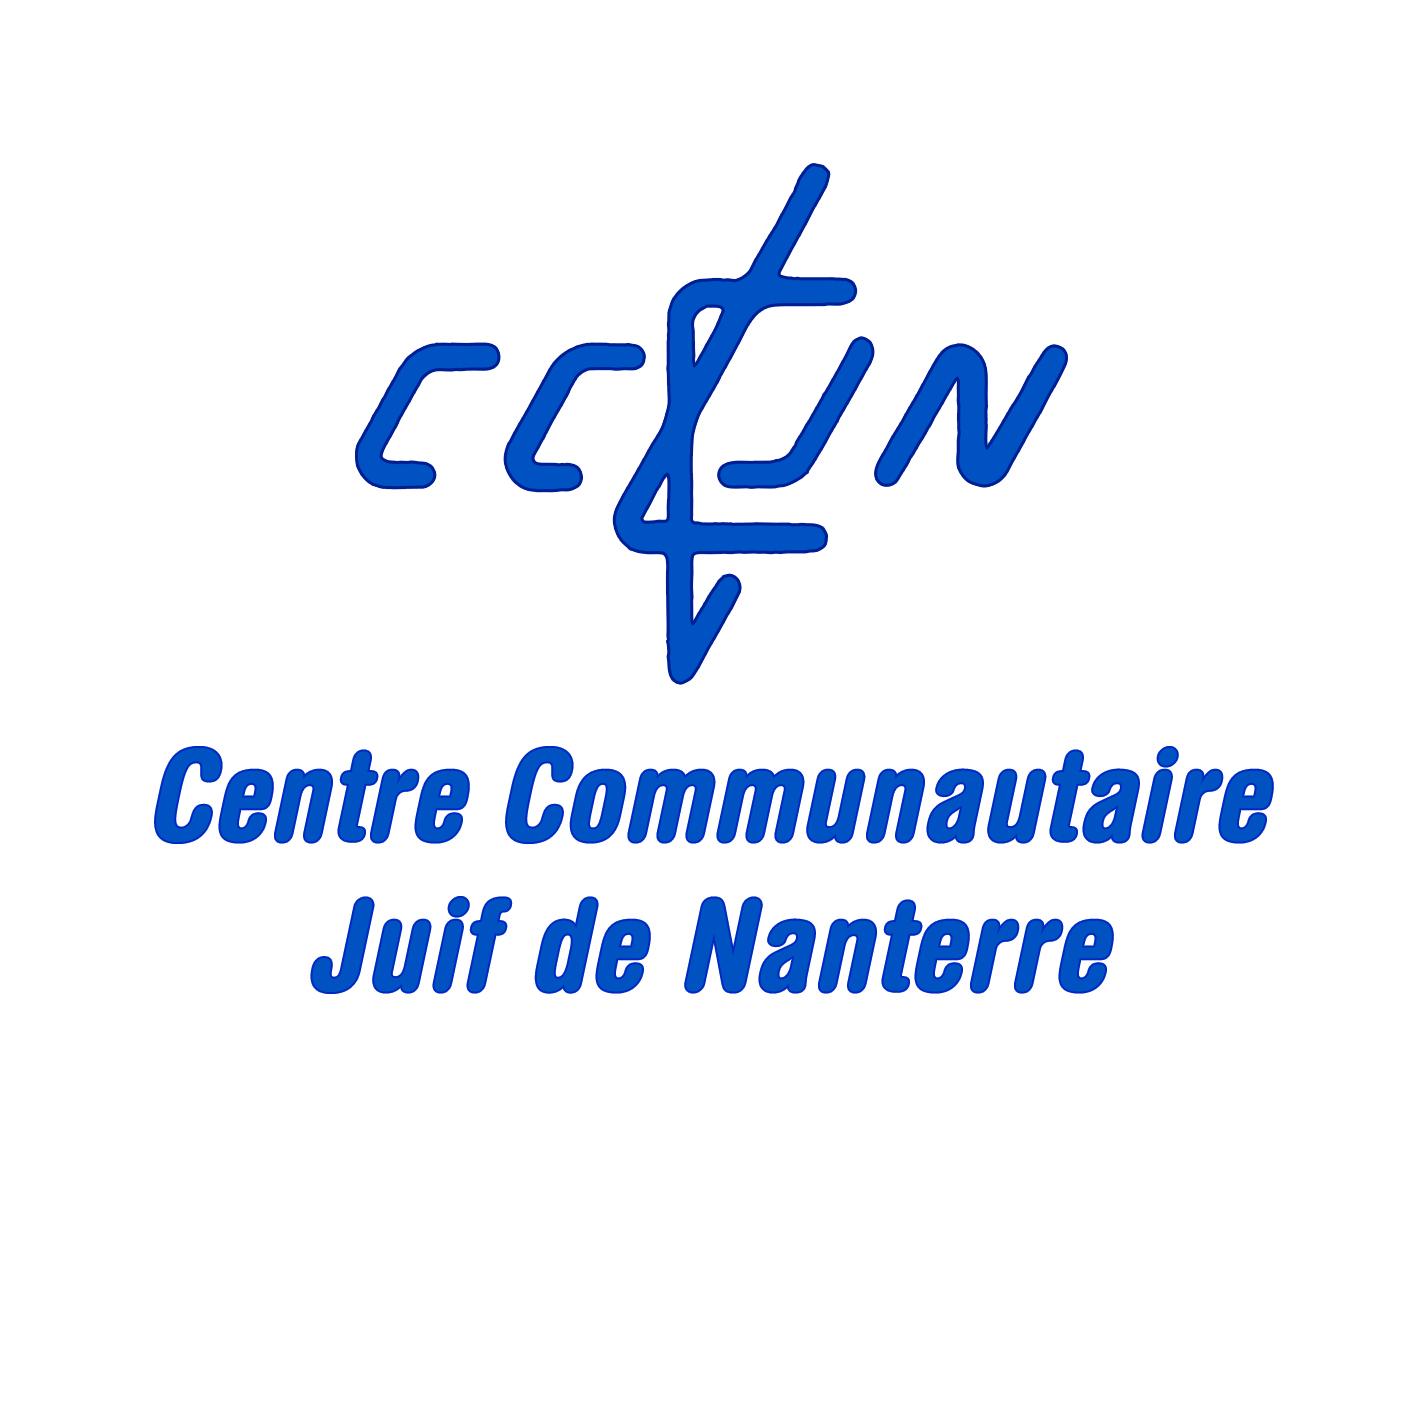 Association - CCJN